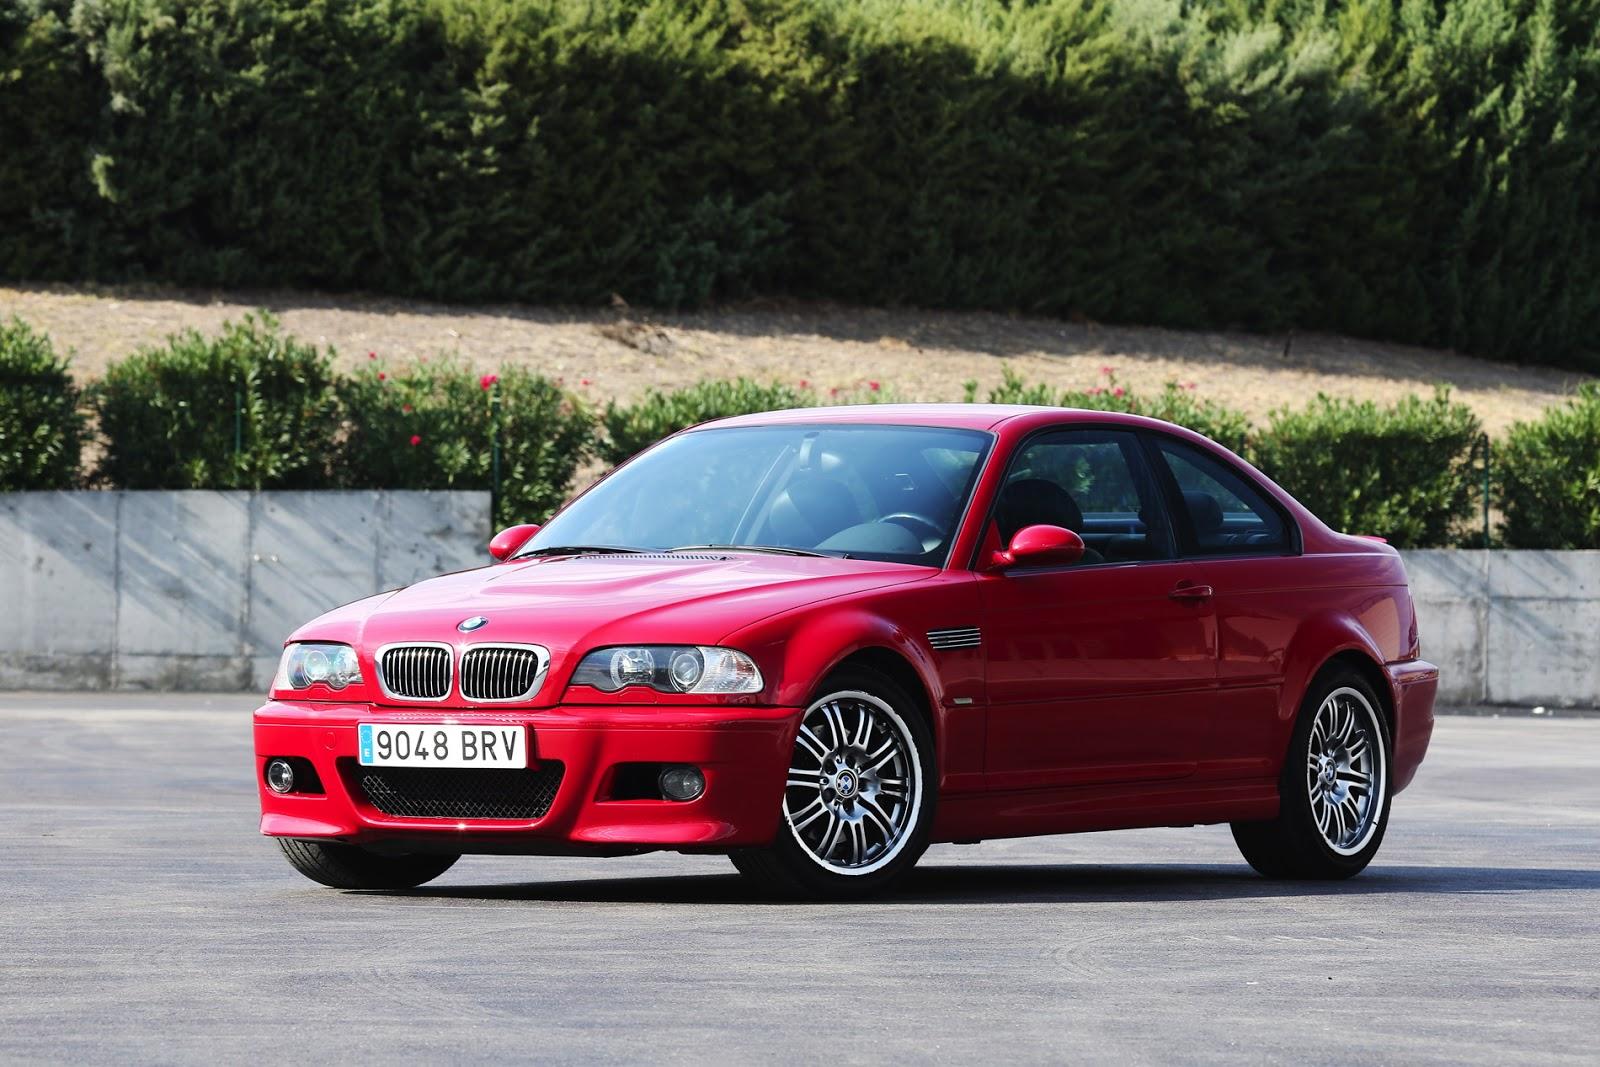 BMW M3 E46 1 6 Μια Bmw M3 E46 πέφτει στον γκρεμό! BMW, BMW M3, BMW M3 E 46, Cliff, videos